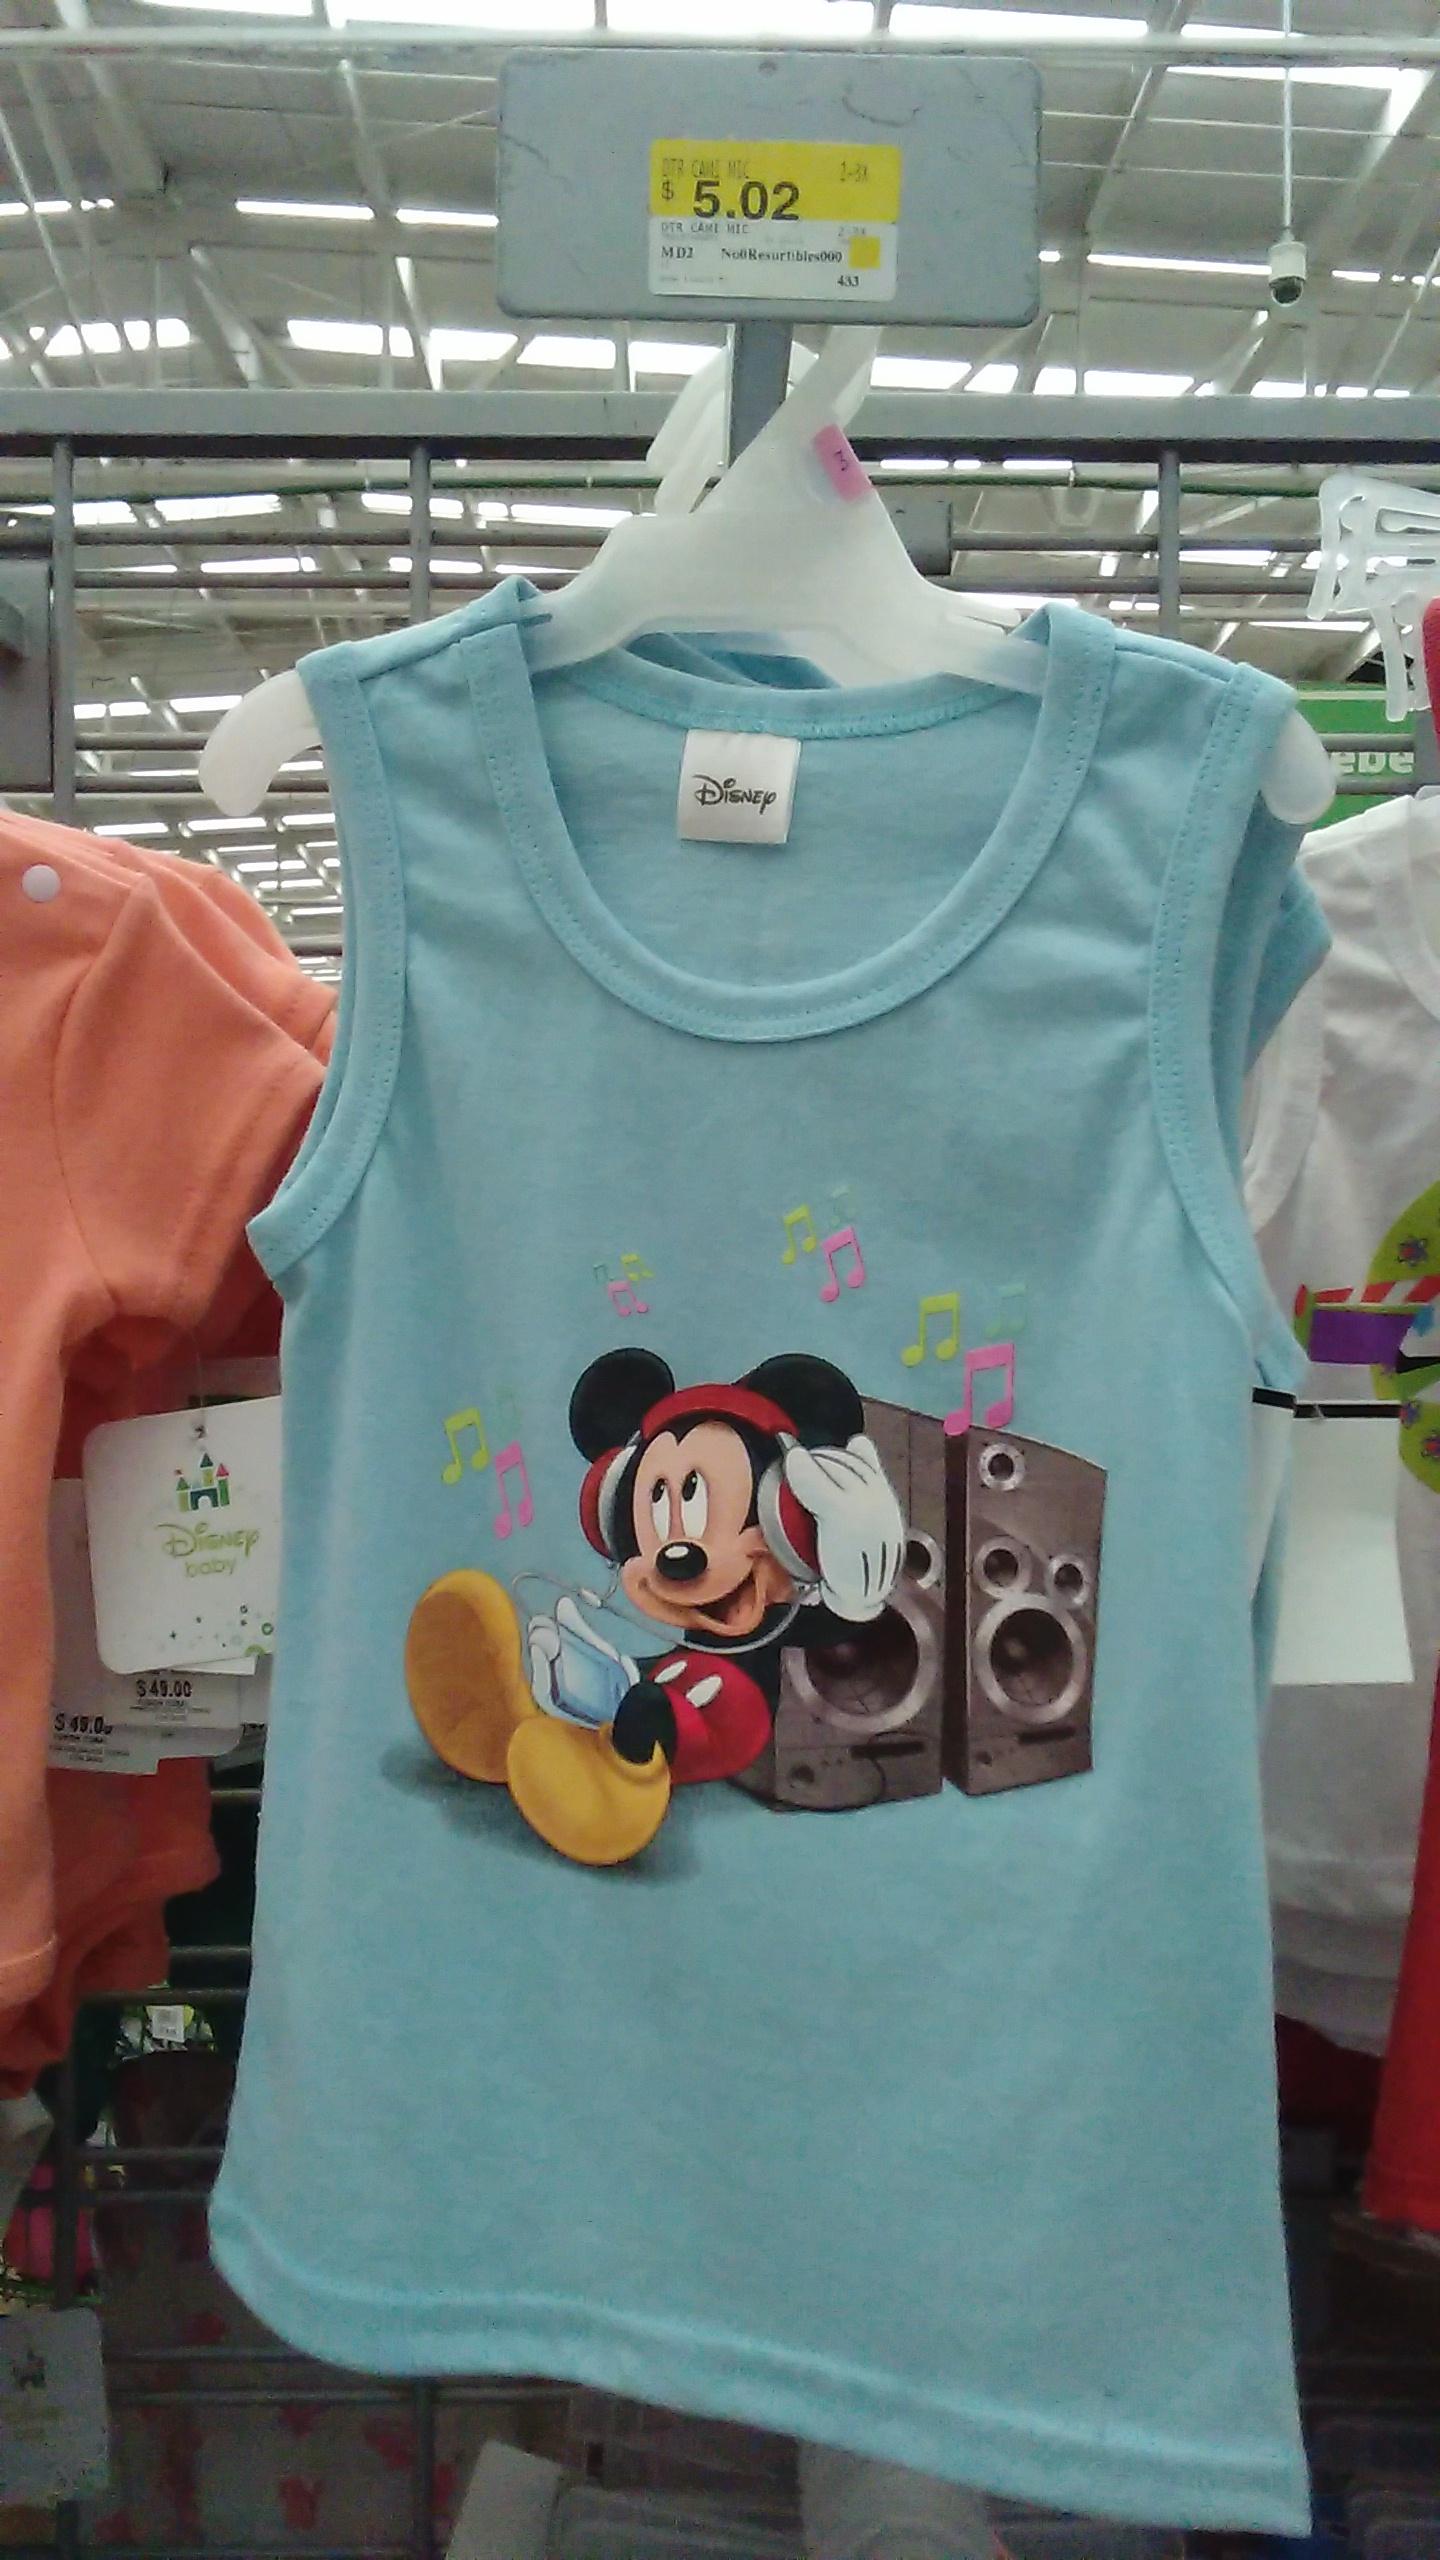 Bodega Aurrerá: camiseta disney para niño desde $5.02